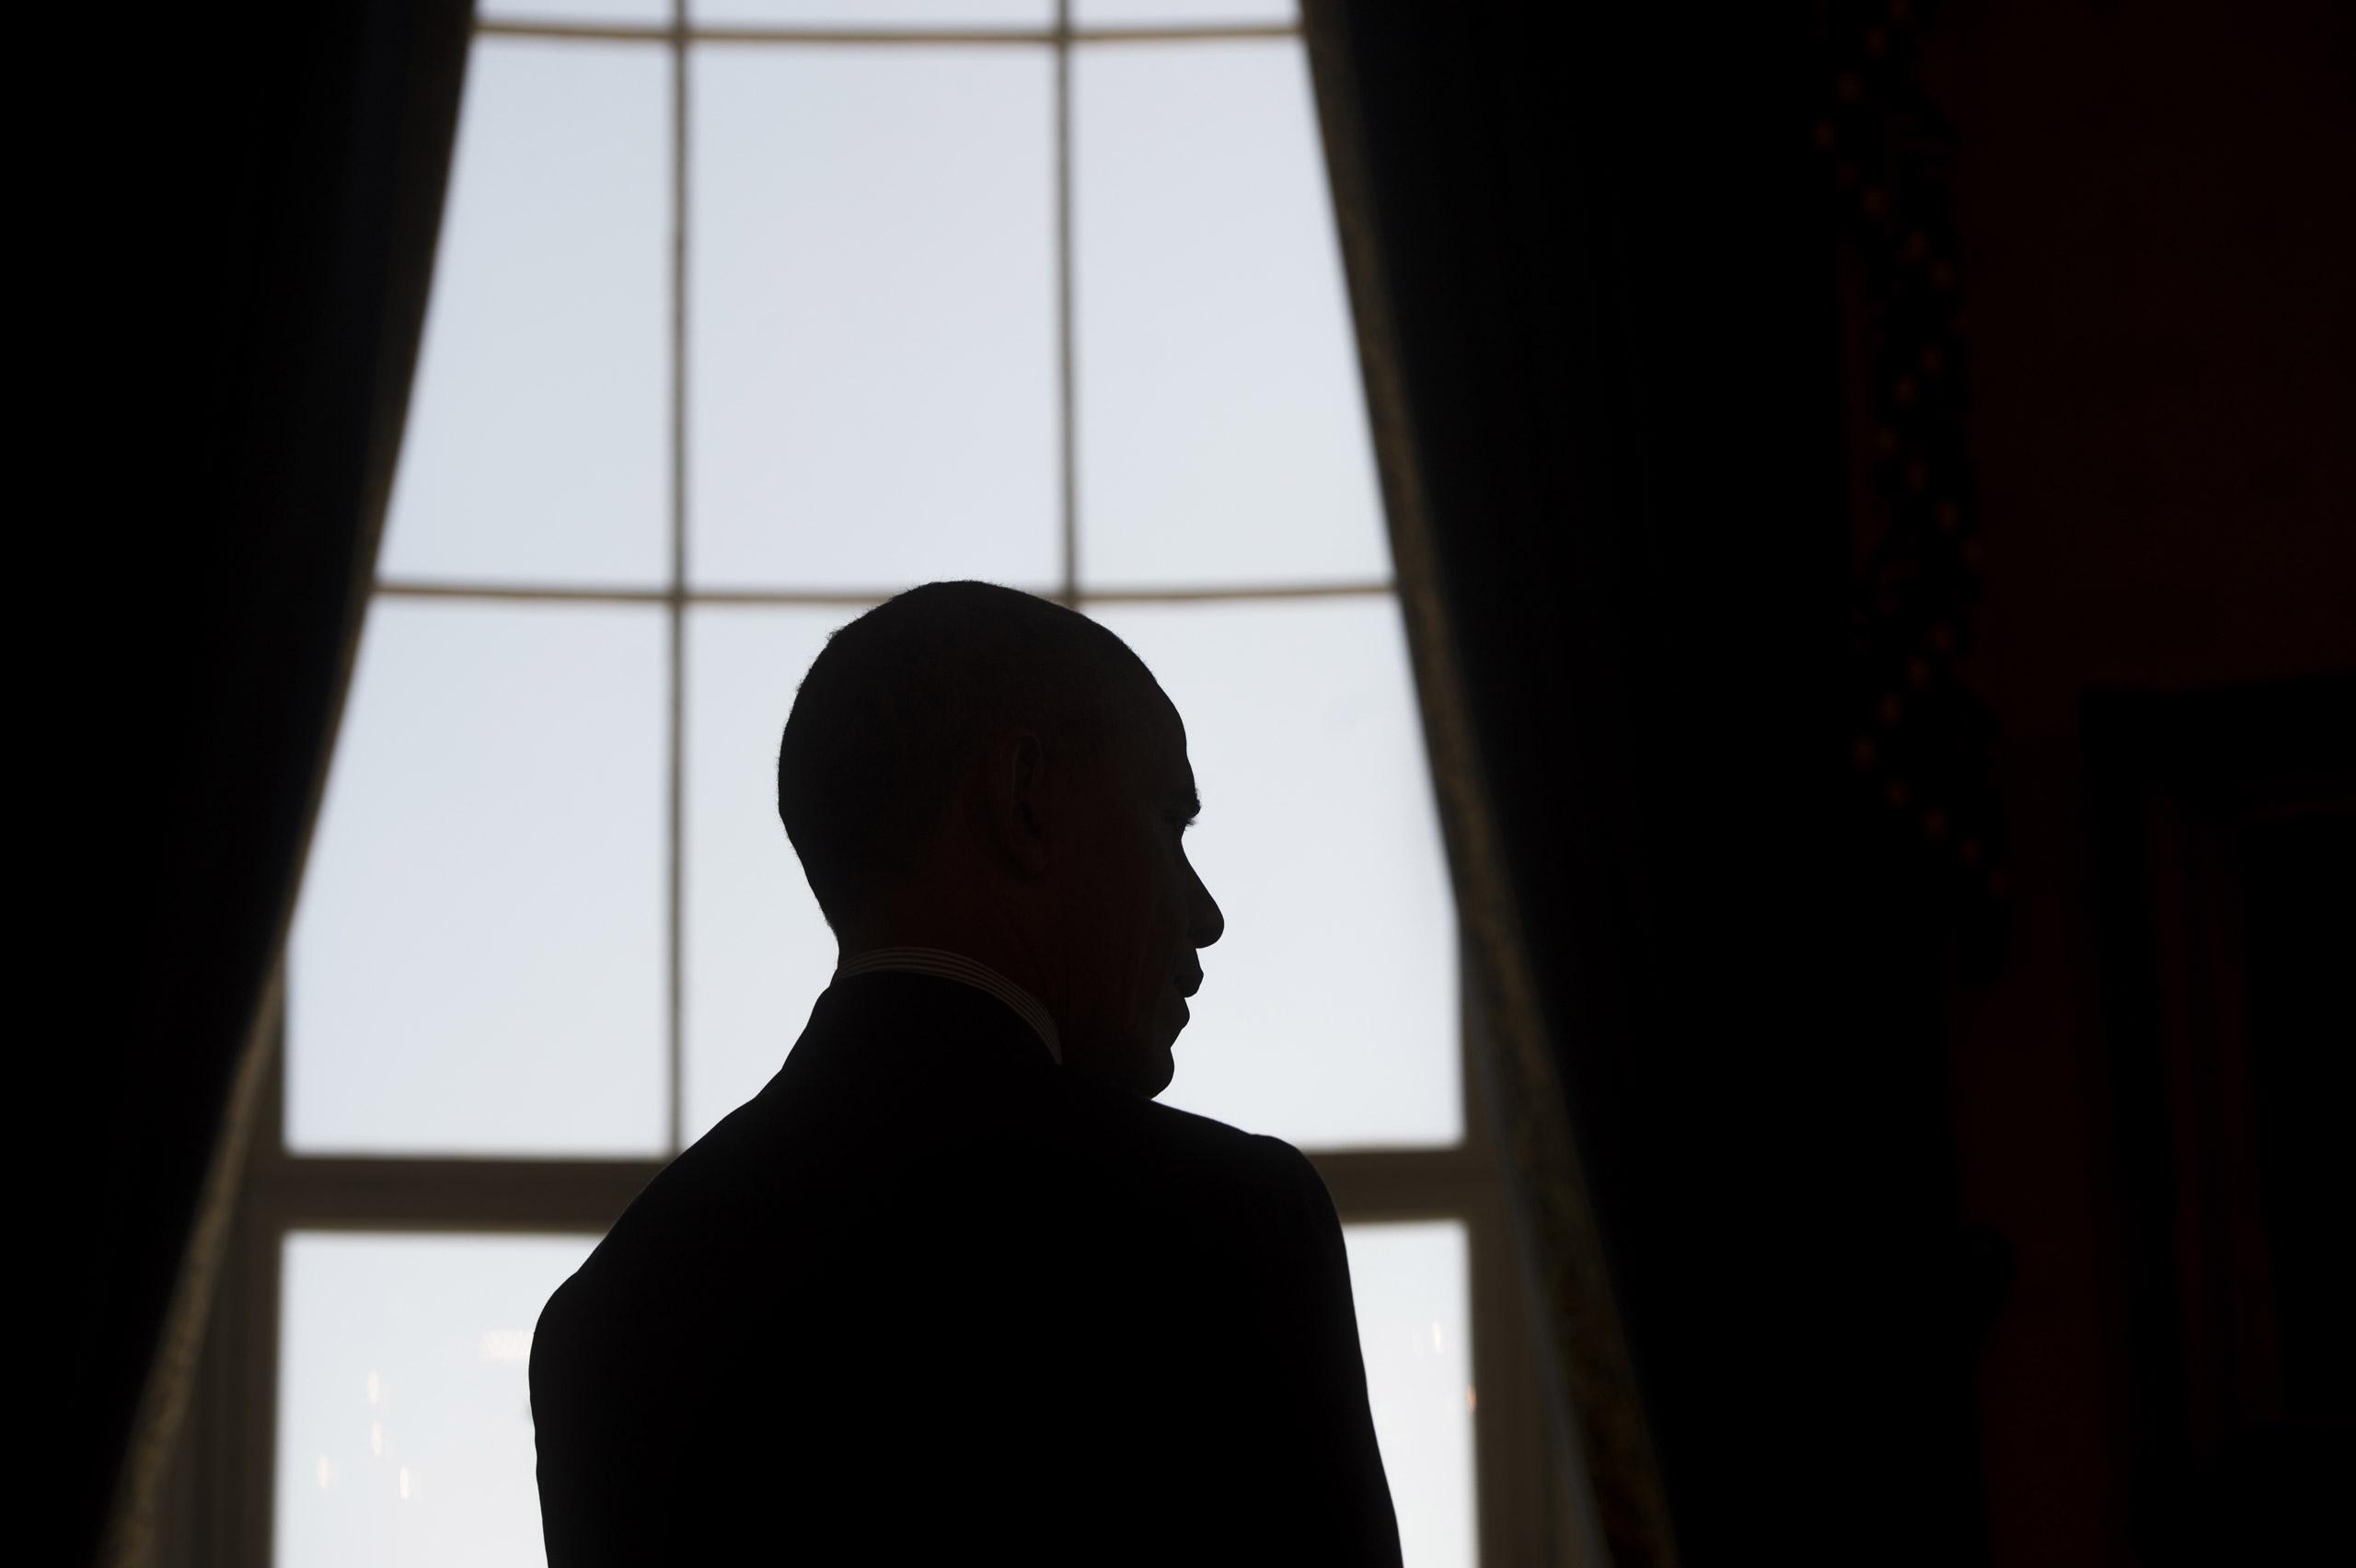 President Barack Obama at the White House in Washington on April 13, 2016.